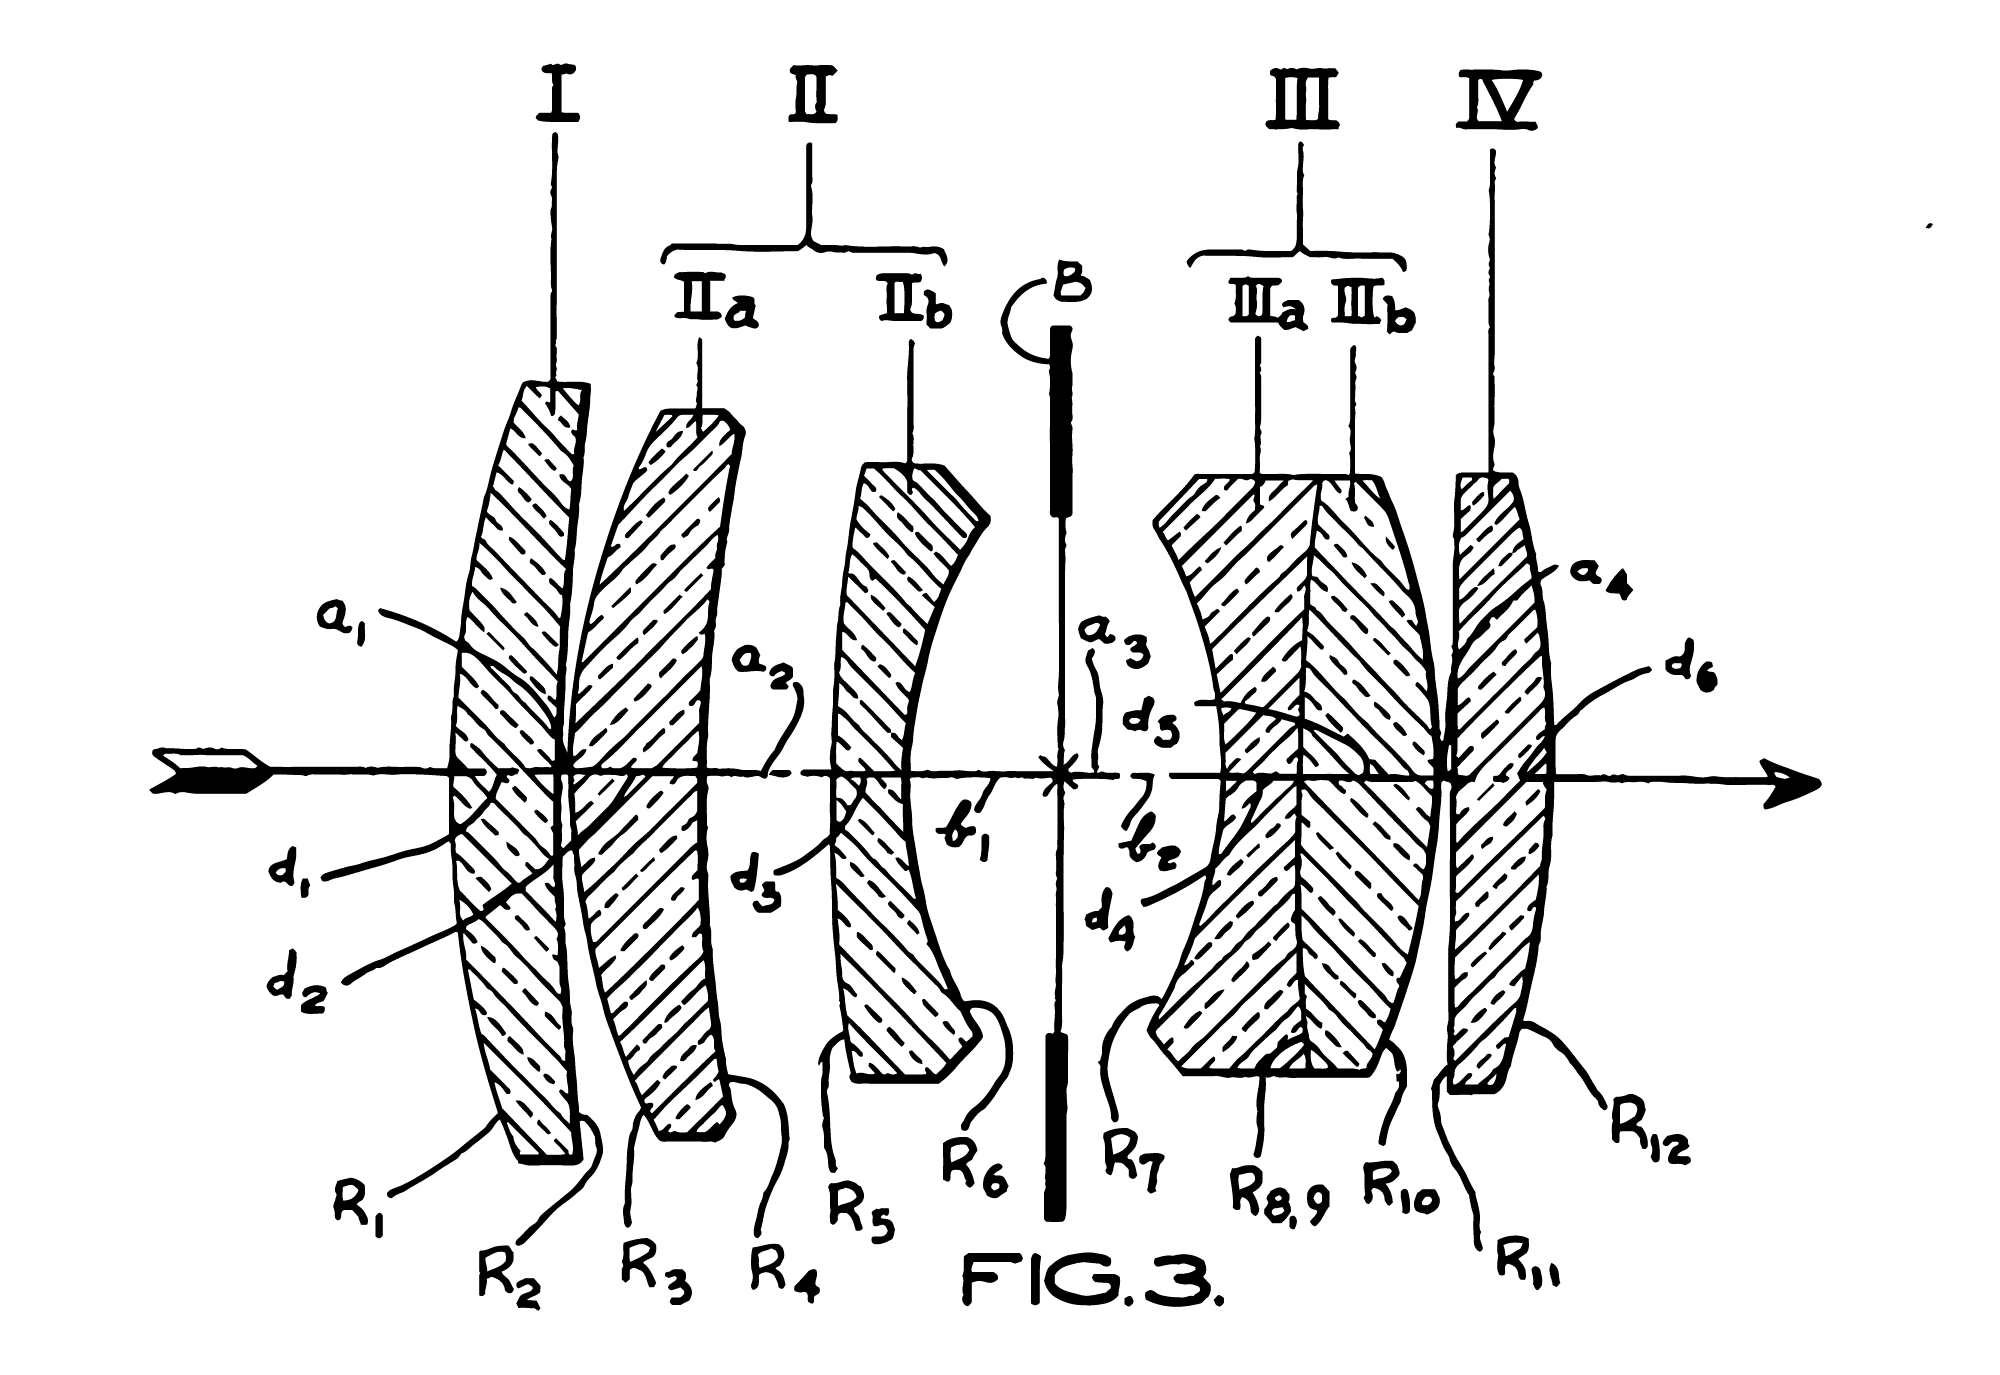 Patent diagram of the Voigtländer Ultron 50mm f2